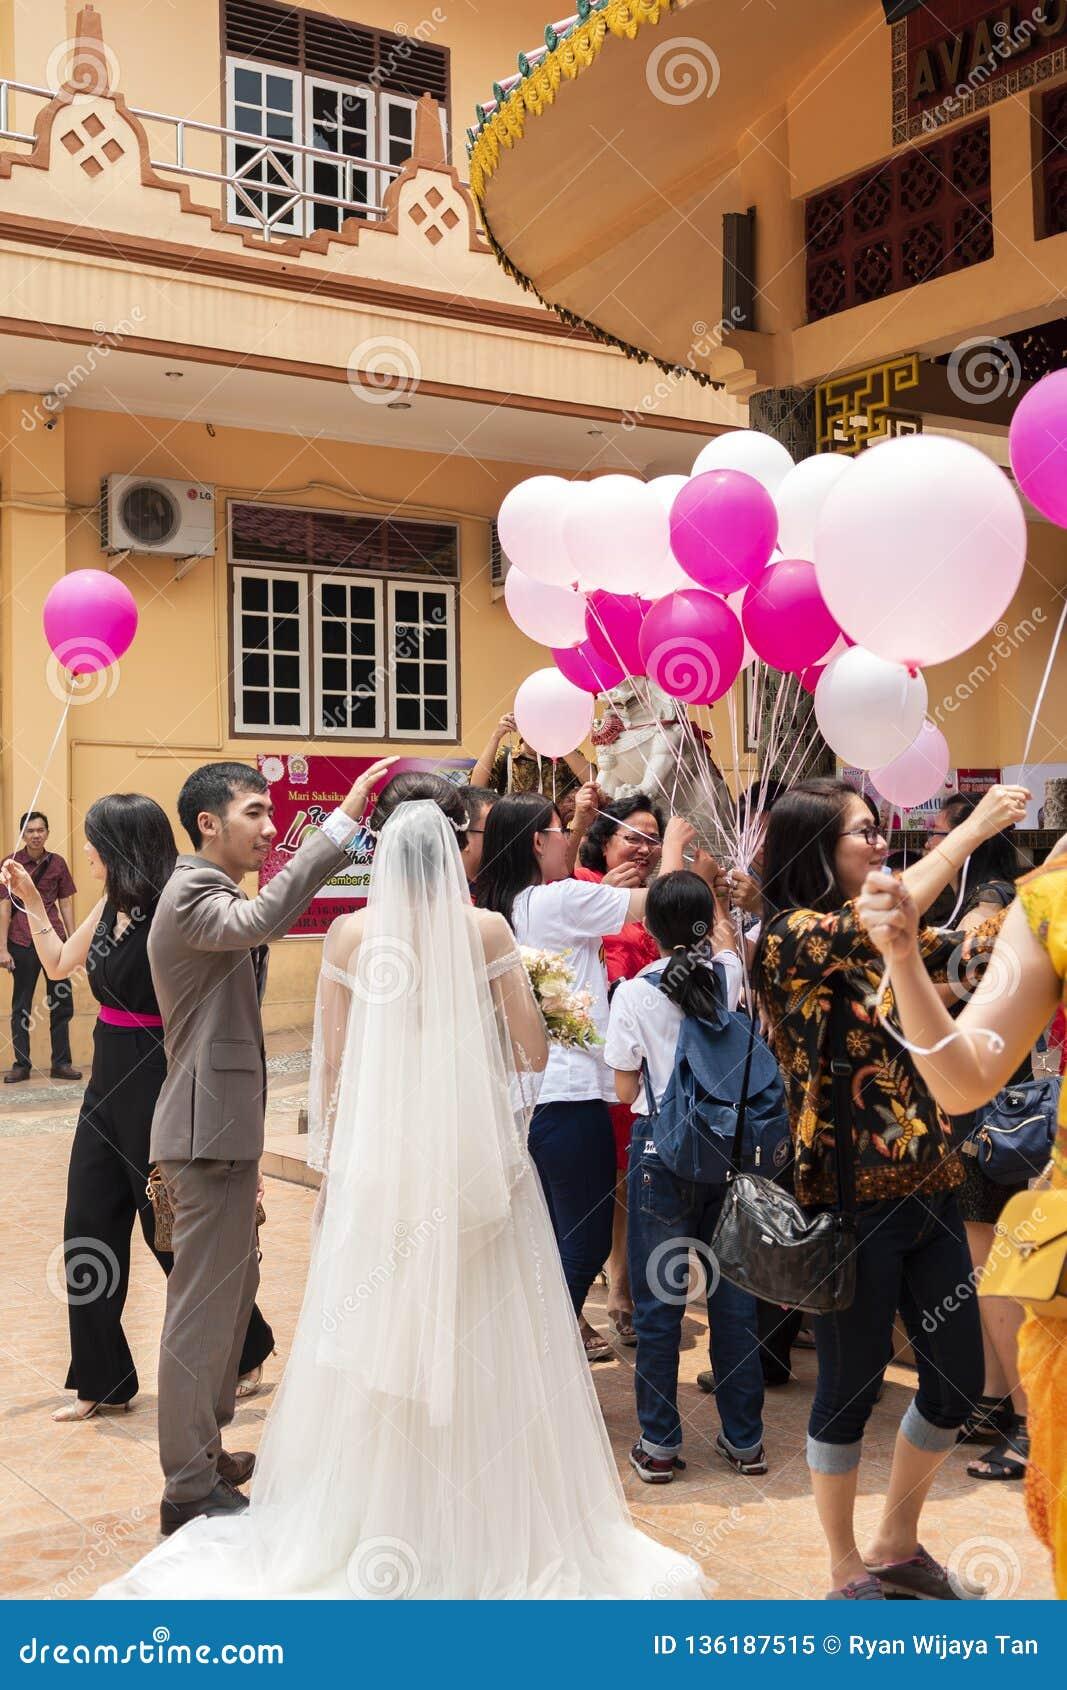 Jambi Indonesien - Oktober 7, 2018: Luftballonger släpptes under en beröm i en kinesisk beröm